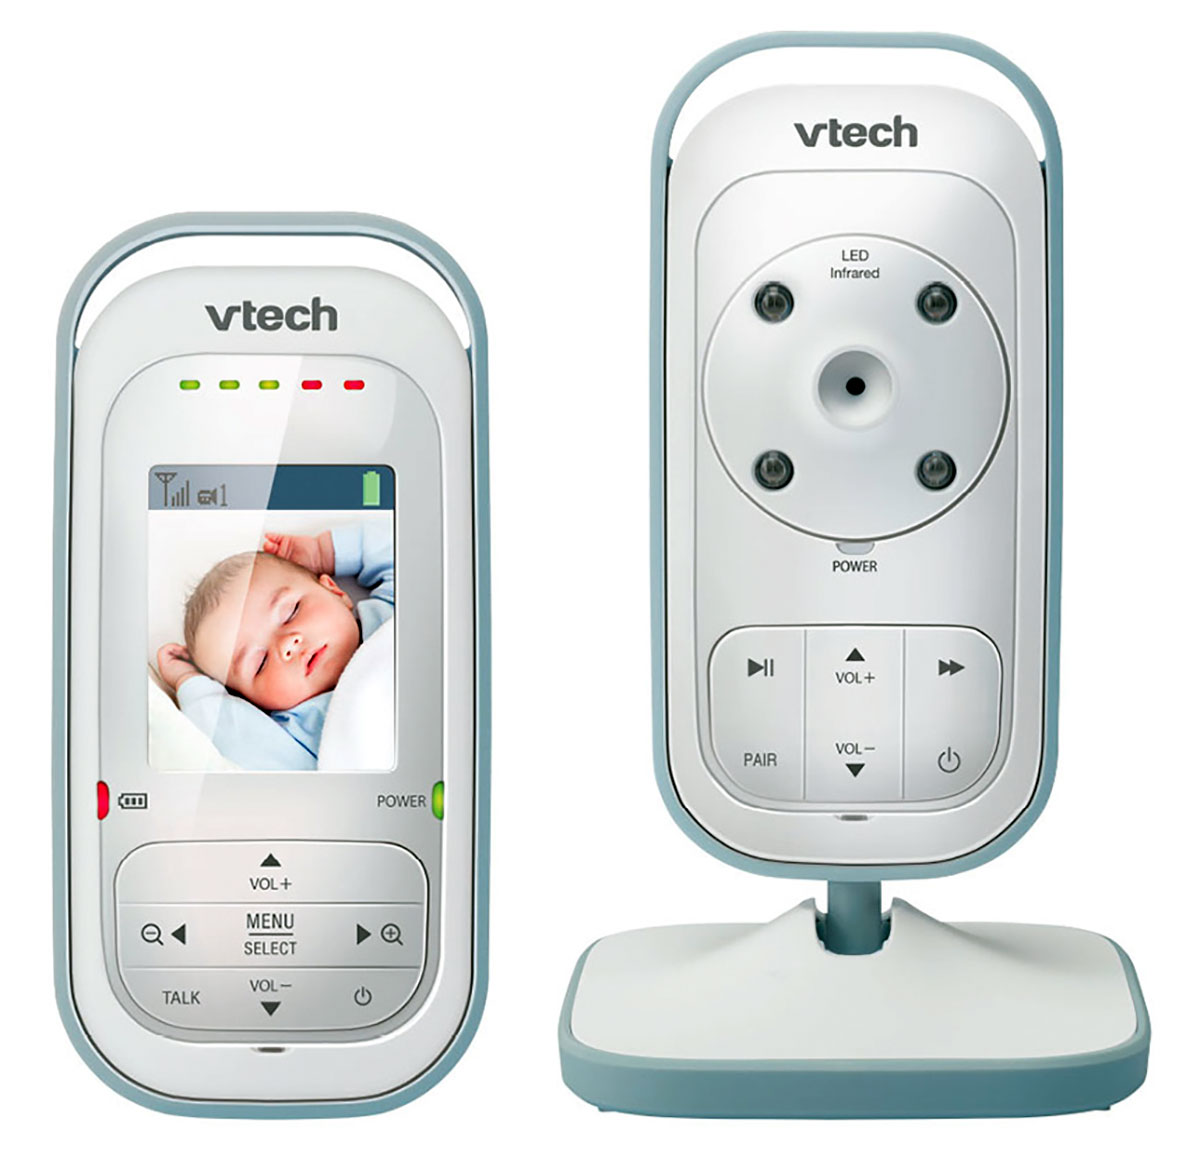 Vtech Видеоняня ВМ2500 - Безопасность ребенка